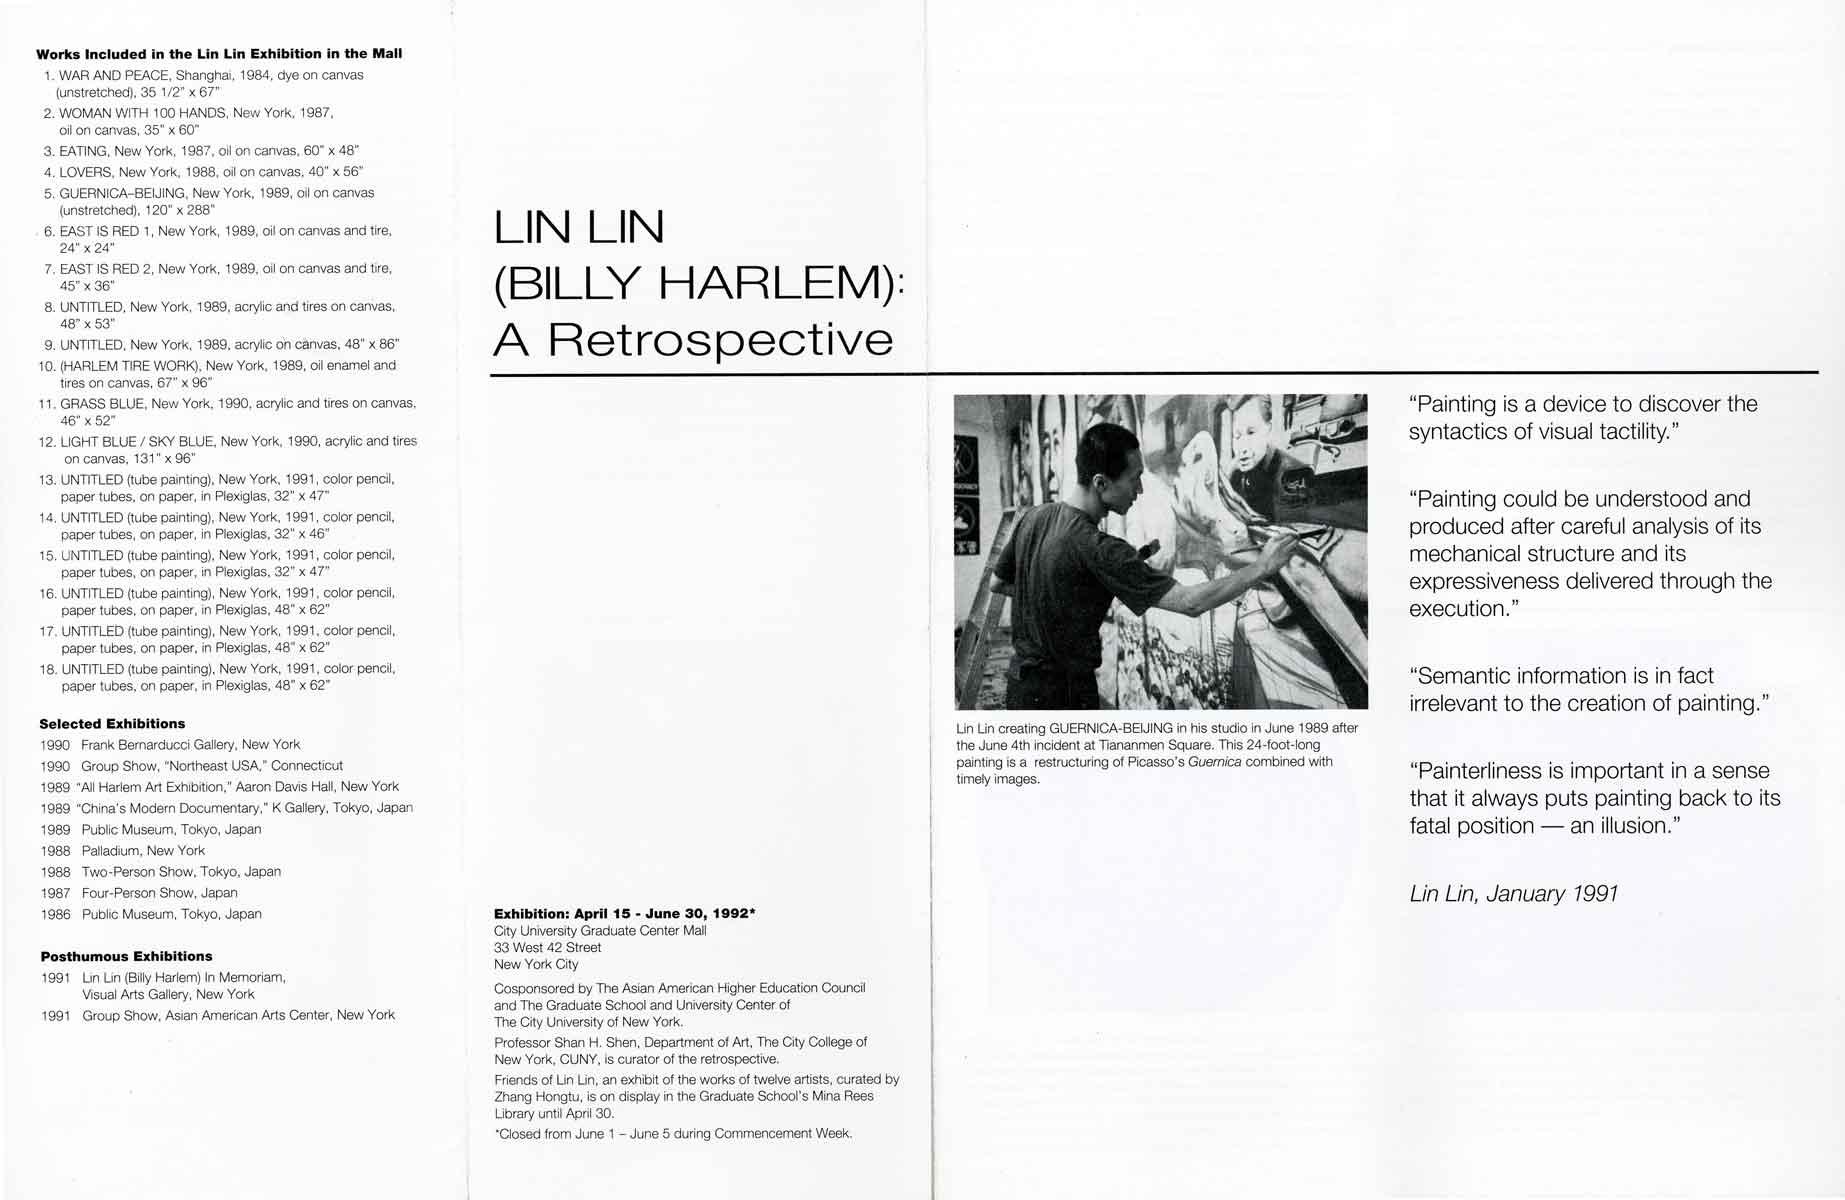 Exhibition Catalog: Lin Lin (Billy Harlem): A Retrospective